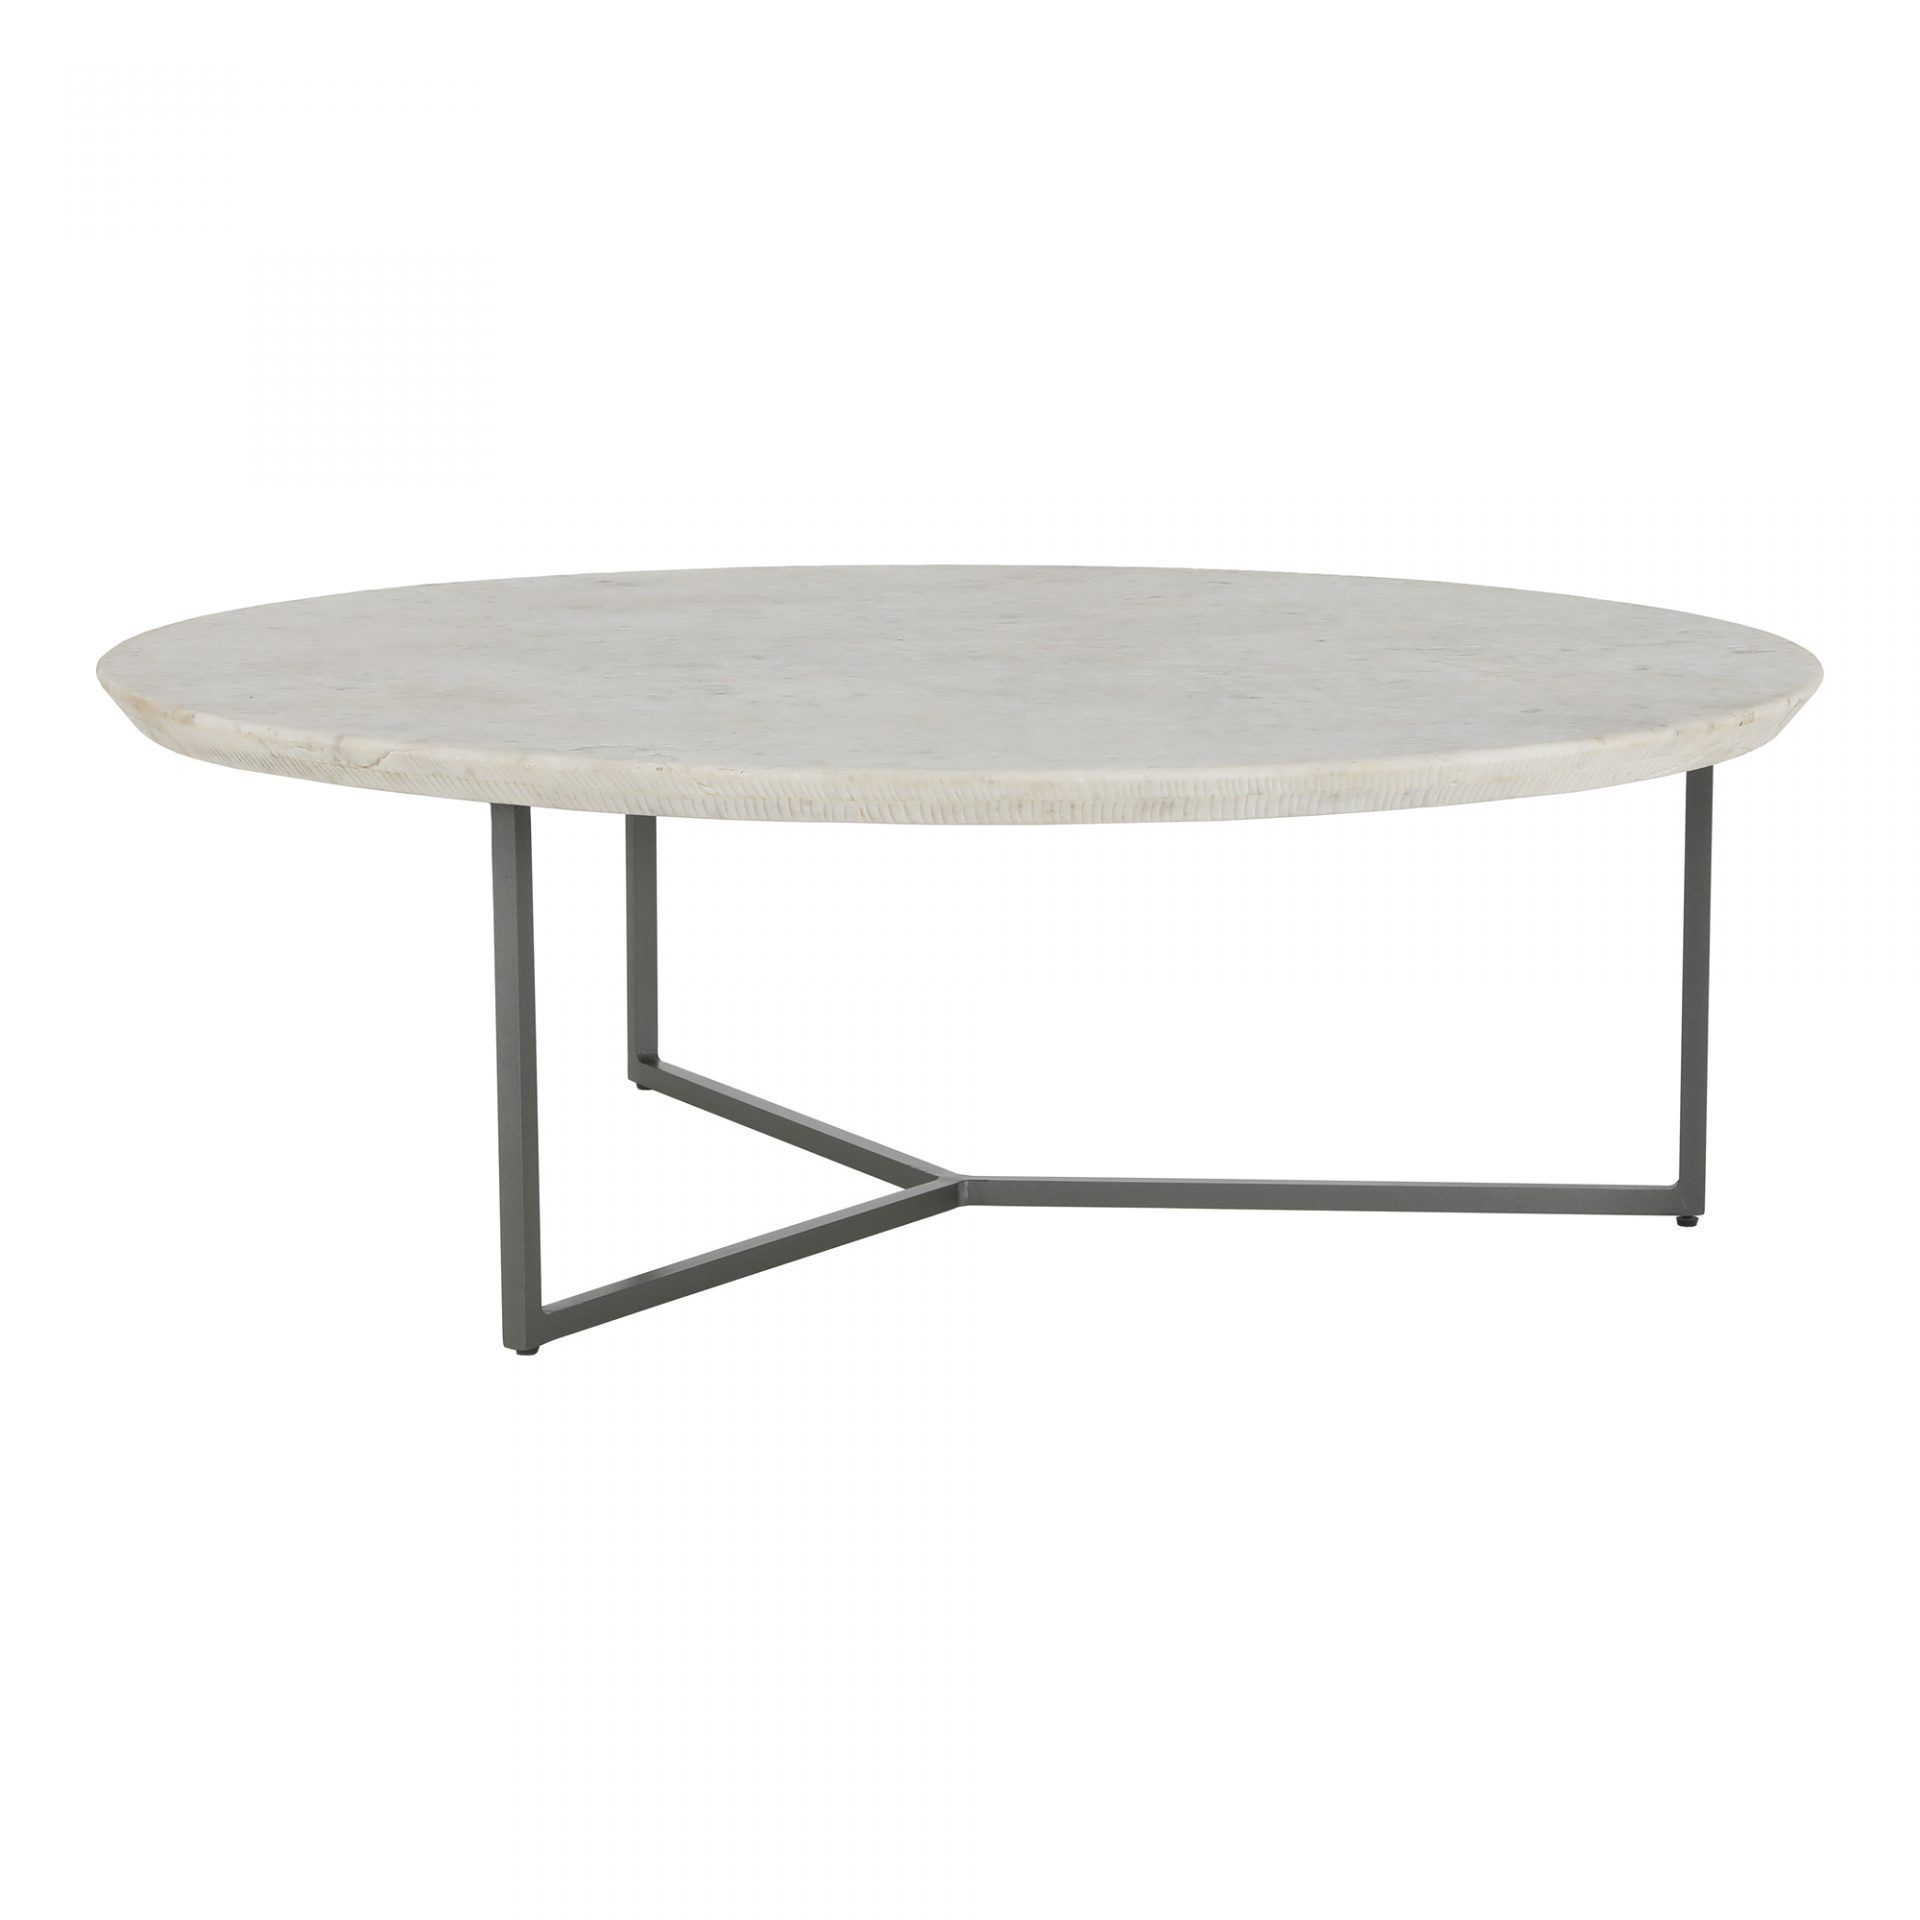 Blu Home Chloe Coffee Table In 2021 Coffee Table Marble Round Coffee Table Contemporary Coffee Table [ 1920 x 1920 Pixel ]